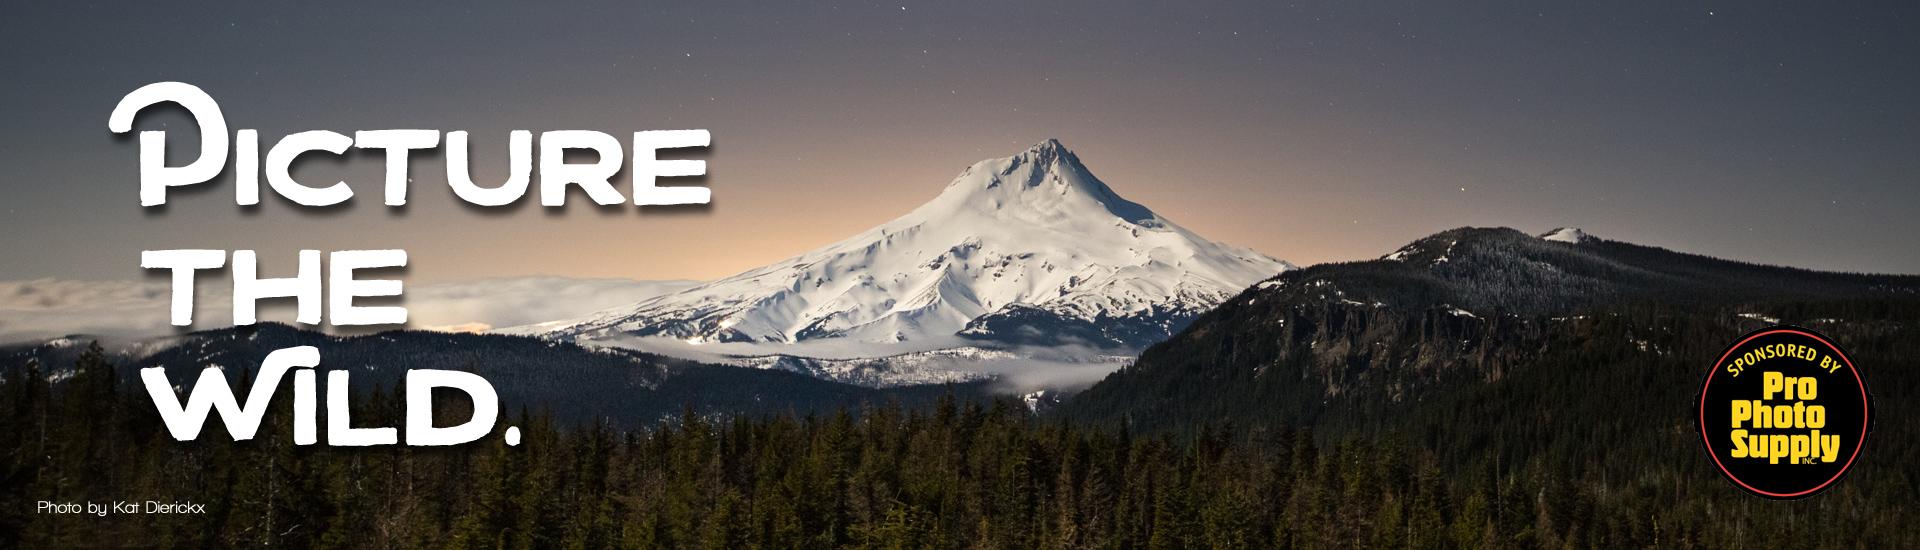 Oregon Wild Outdoor Photo Contest (Flag Point photo by Kat Dierickx)